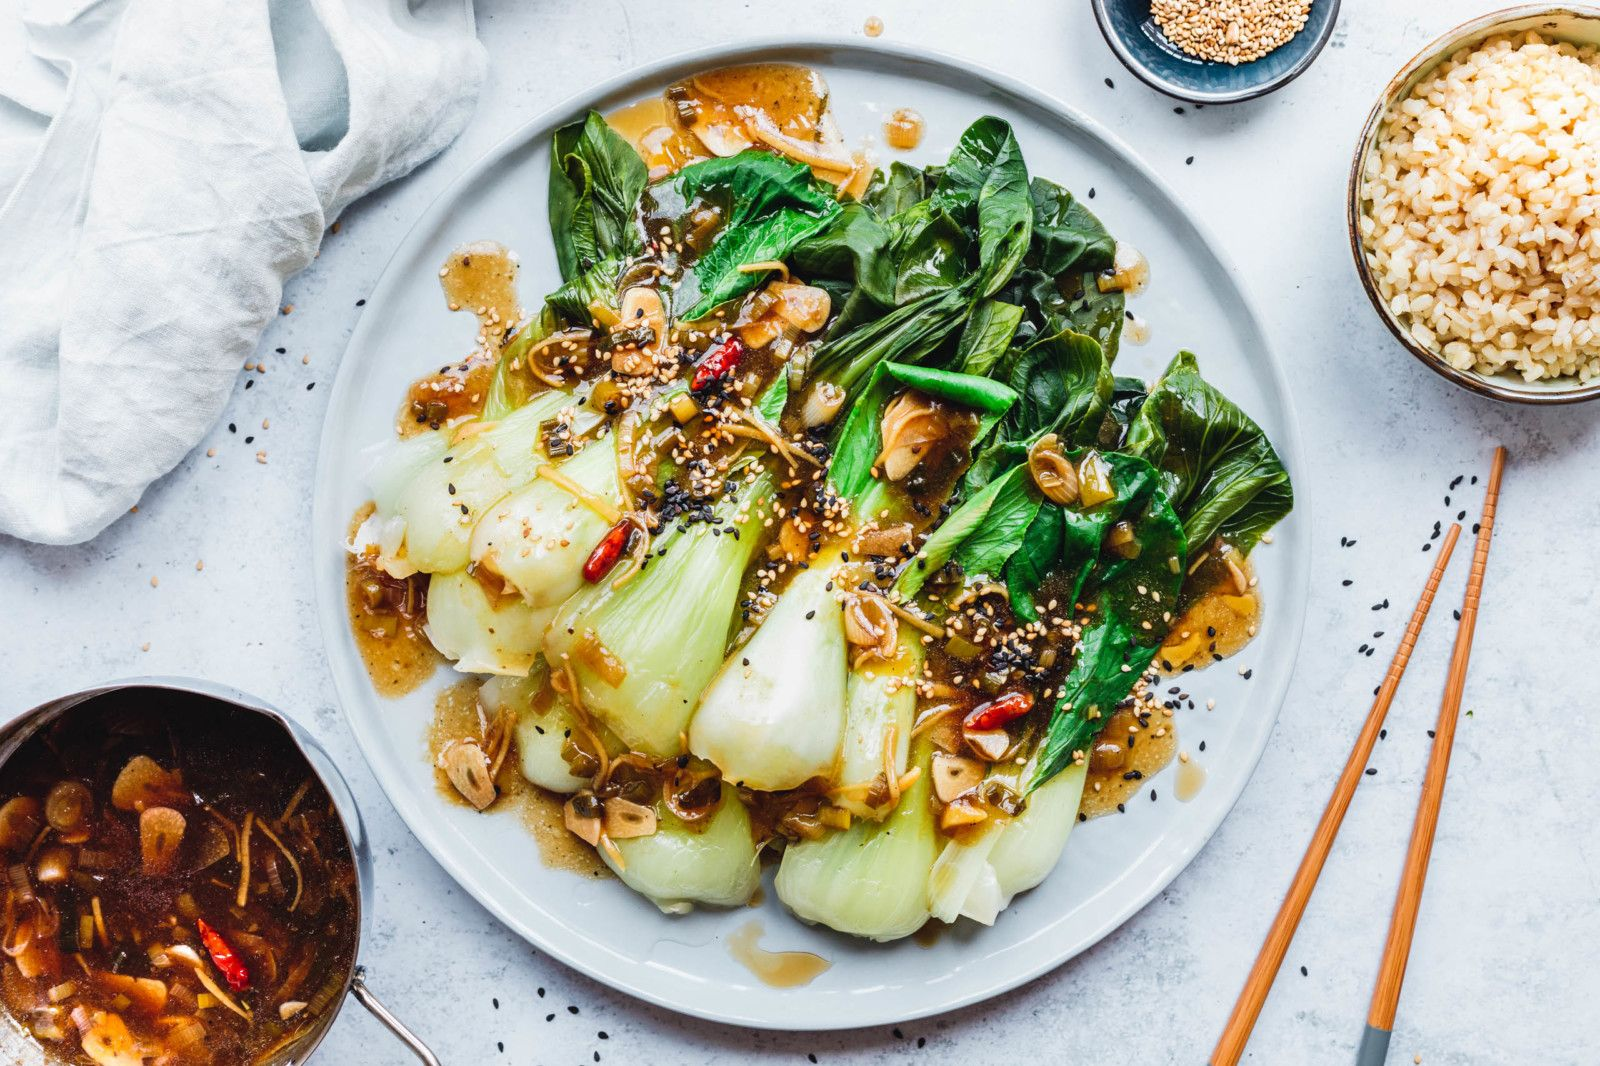 Gedämpfter Pak Choi mit Knoblauch-Ingwer-Sauce · Eat this! Food Blog